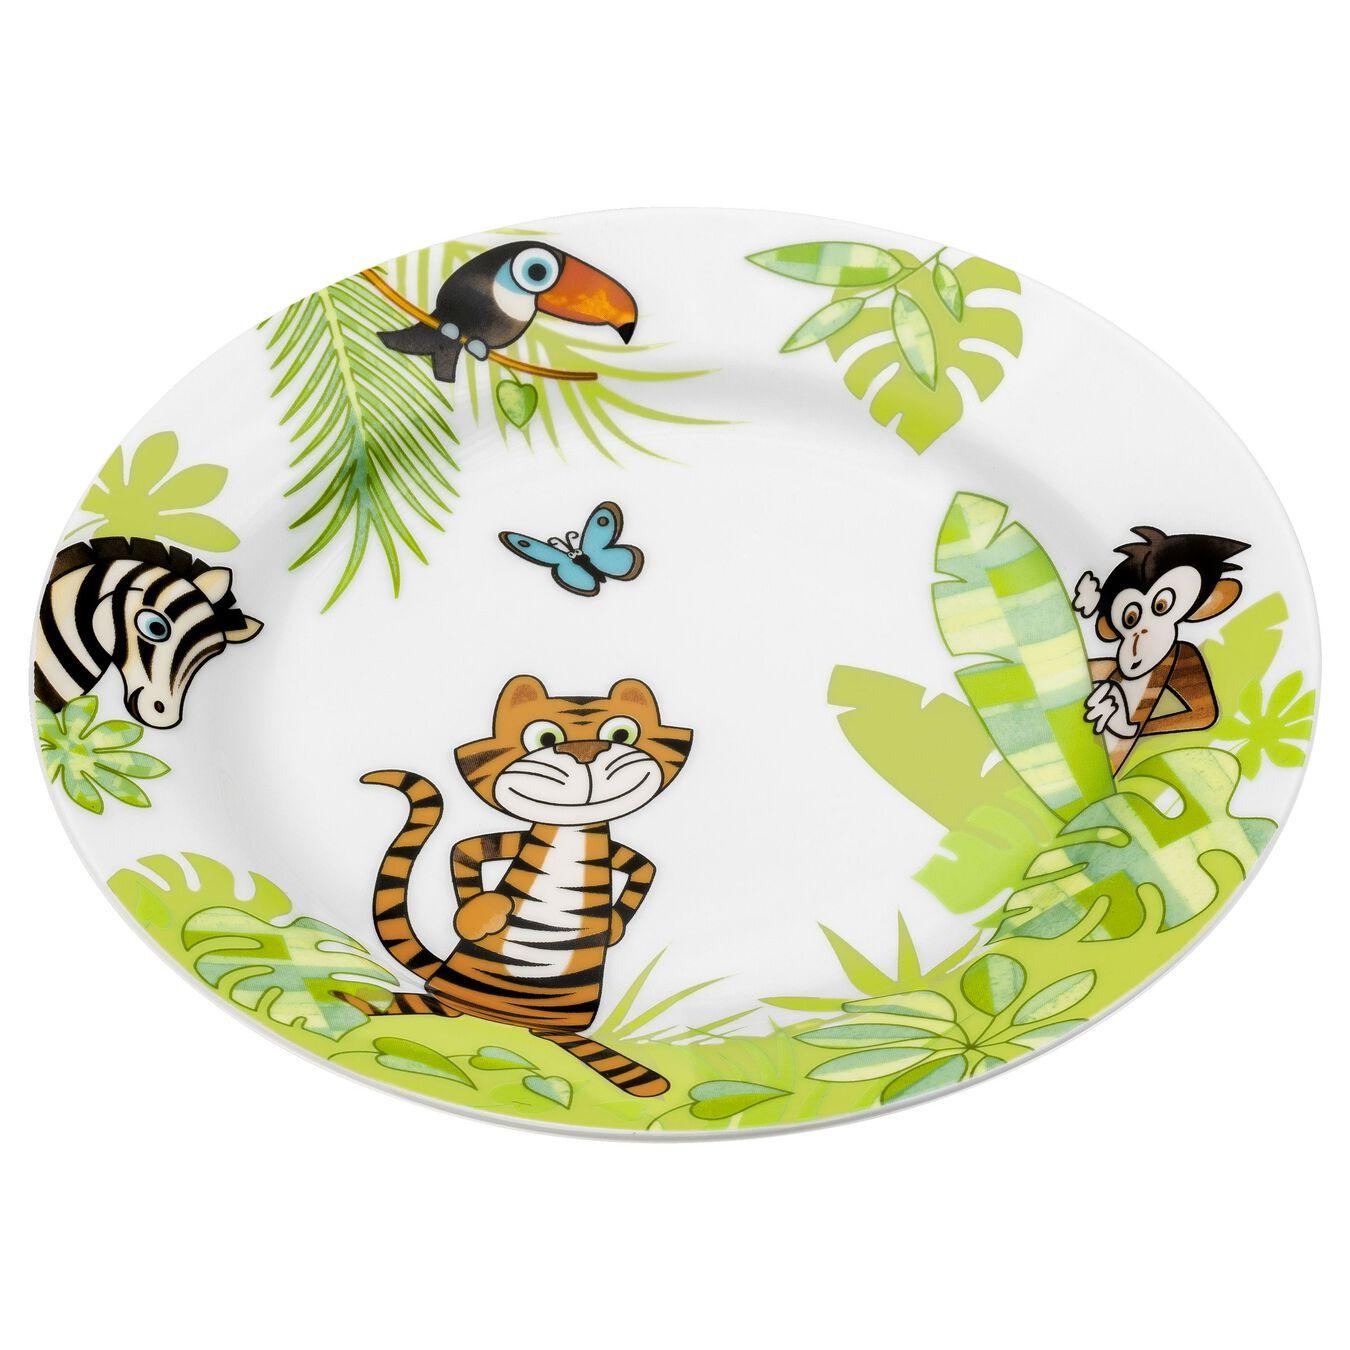 3-pc Children's Dinnerware Set,,large 5